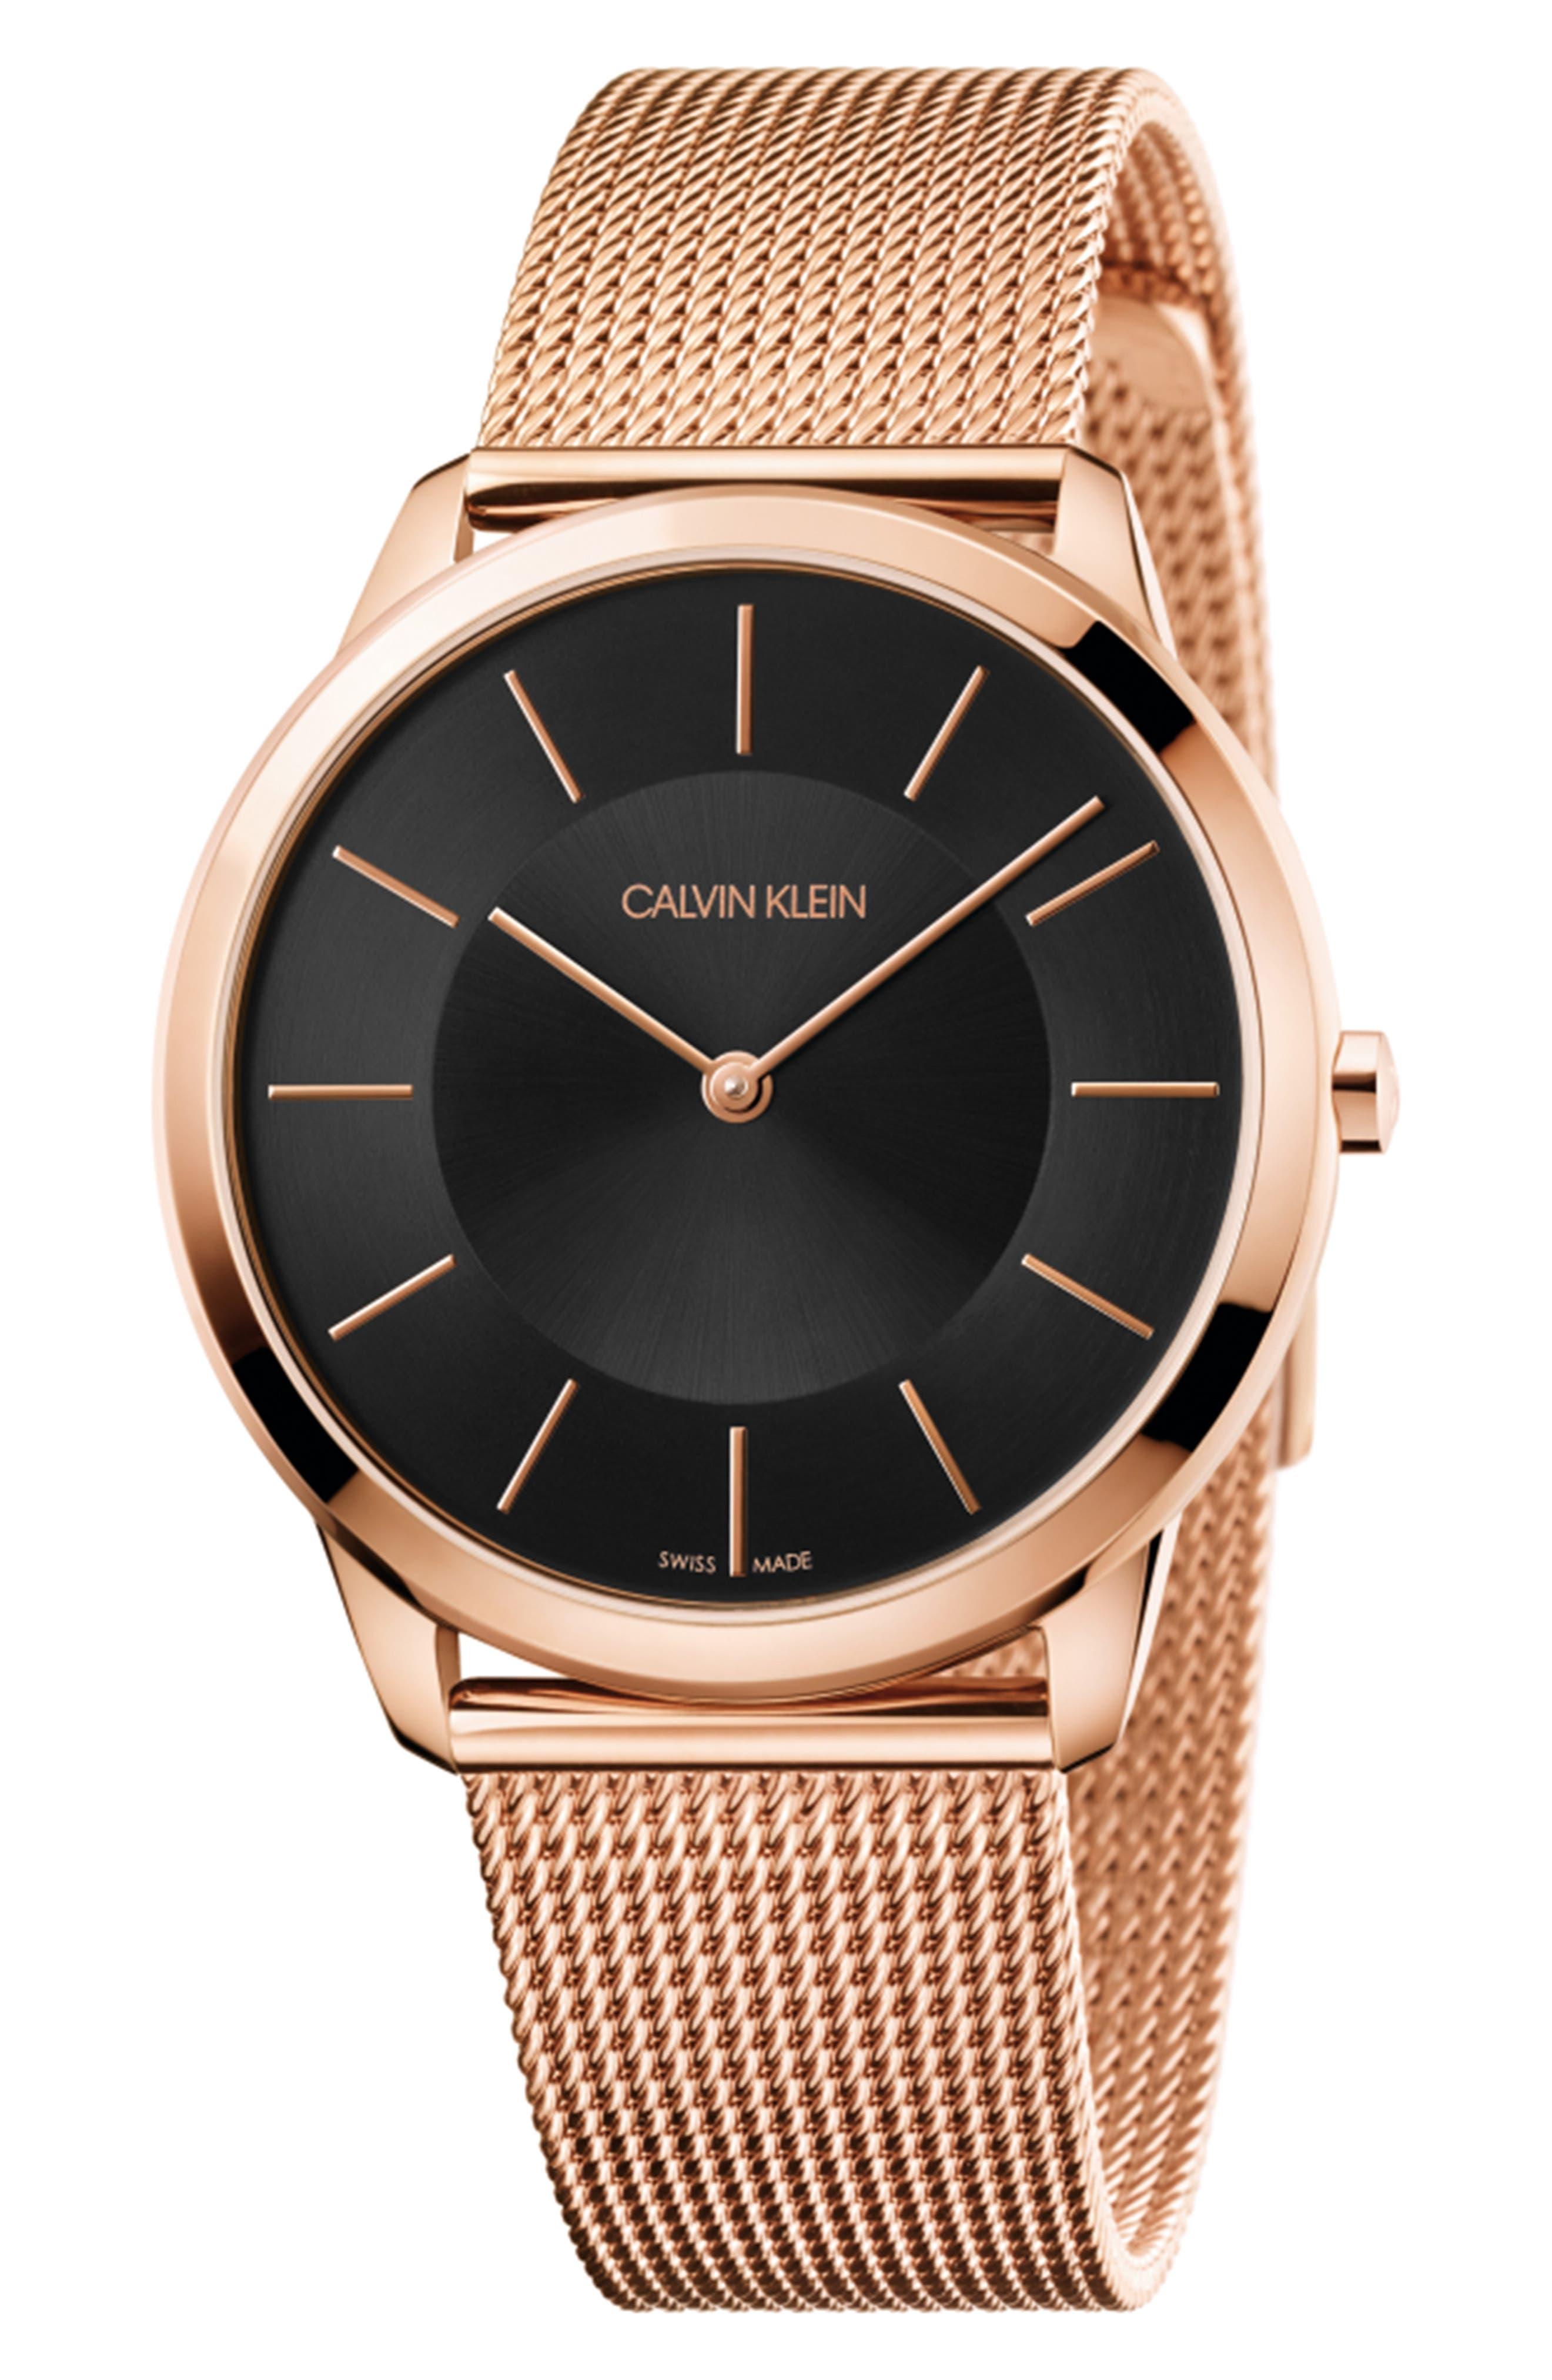 CALVIN KLEIN Minimal Mesh Strap Watch, 40mm, Main, color, ROSE GOLD/ BLACK/ ROSE GOLD